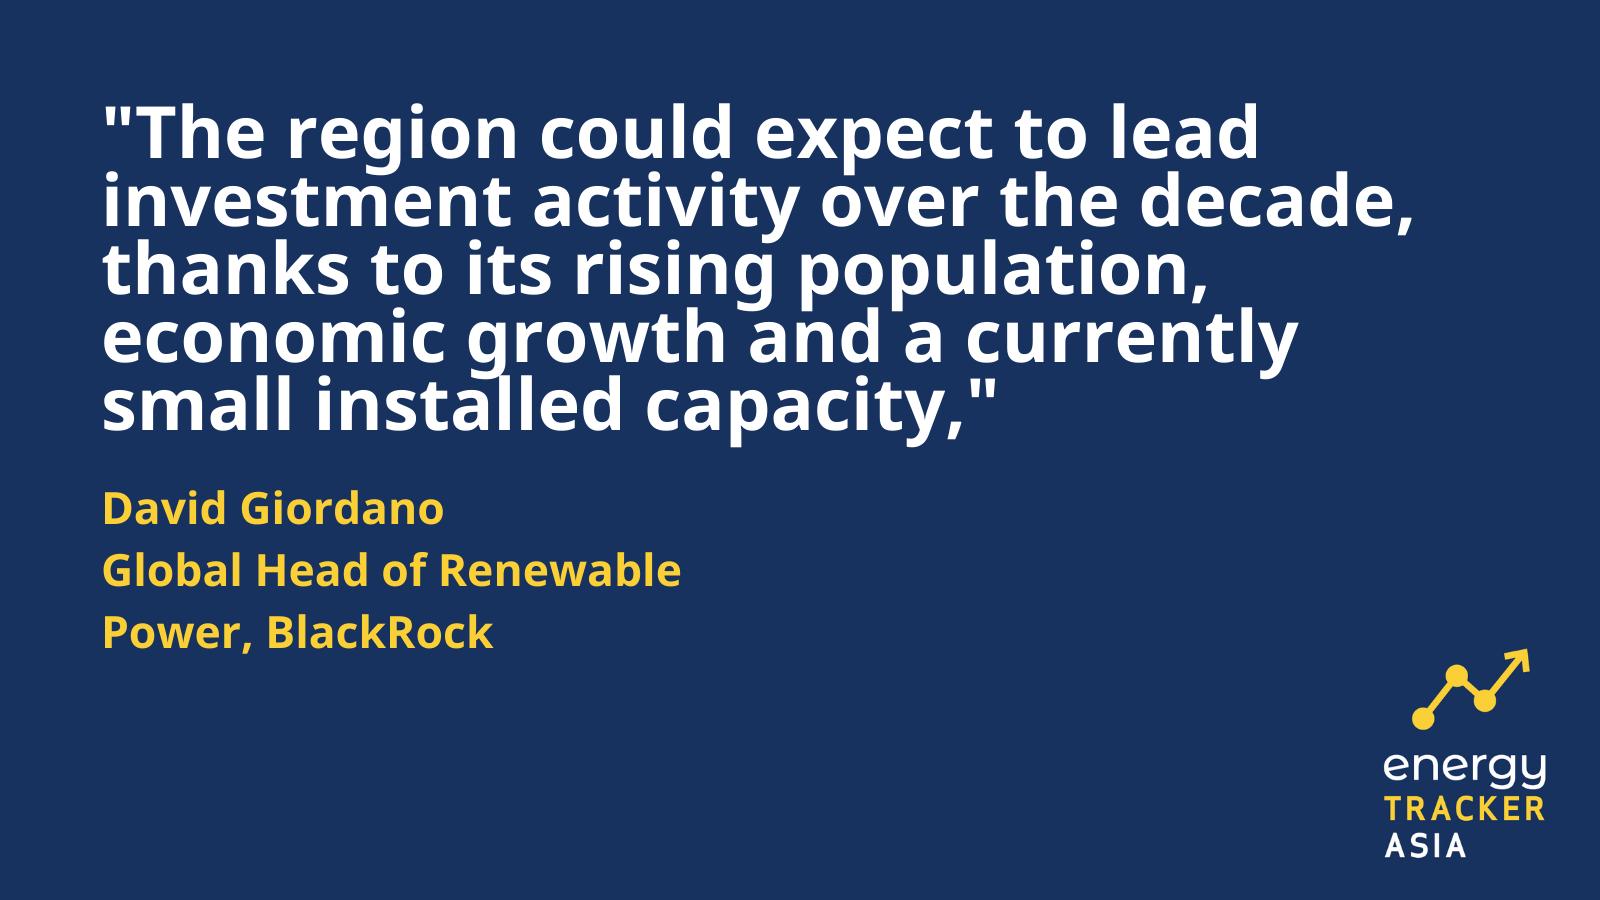 renewable energy, renewable energy investment,  clean energy investment, clean energy financing, green energy investment